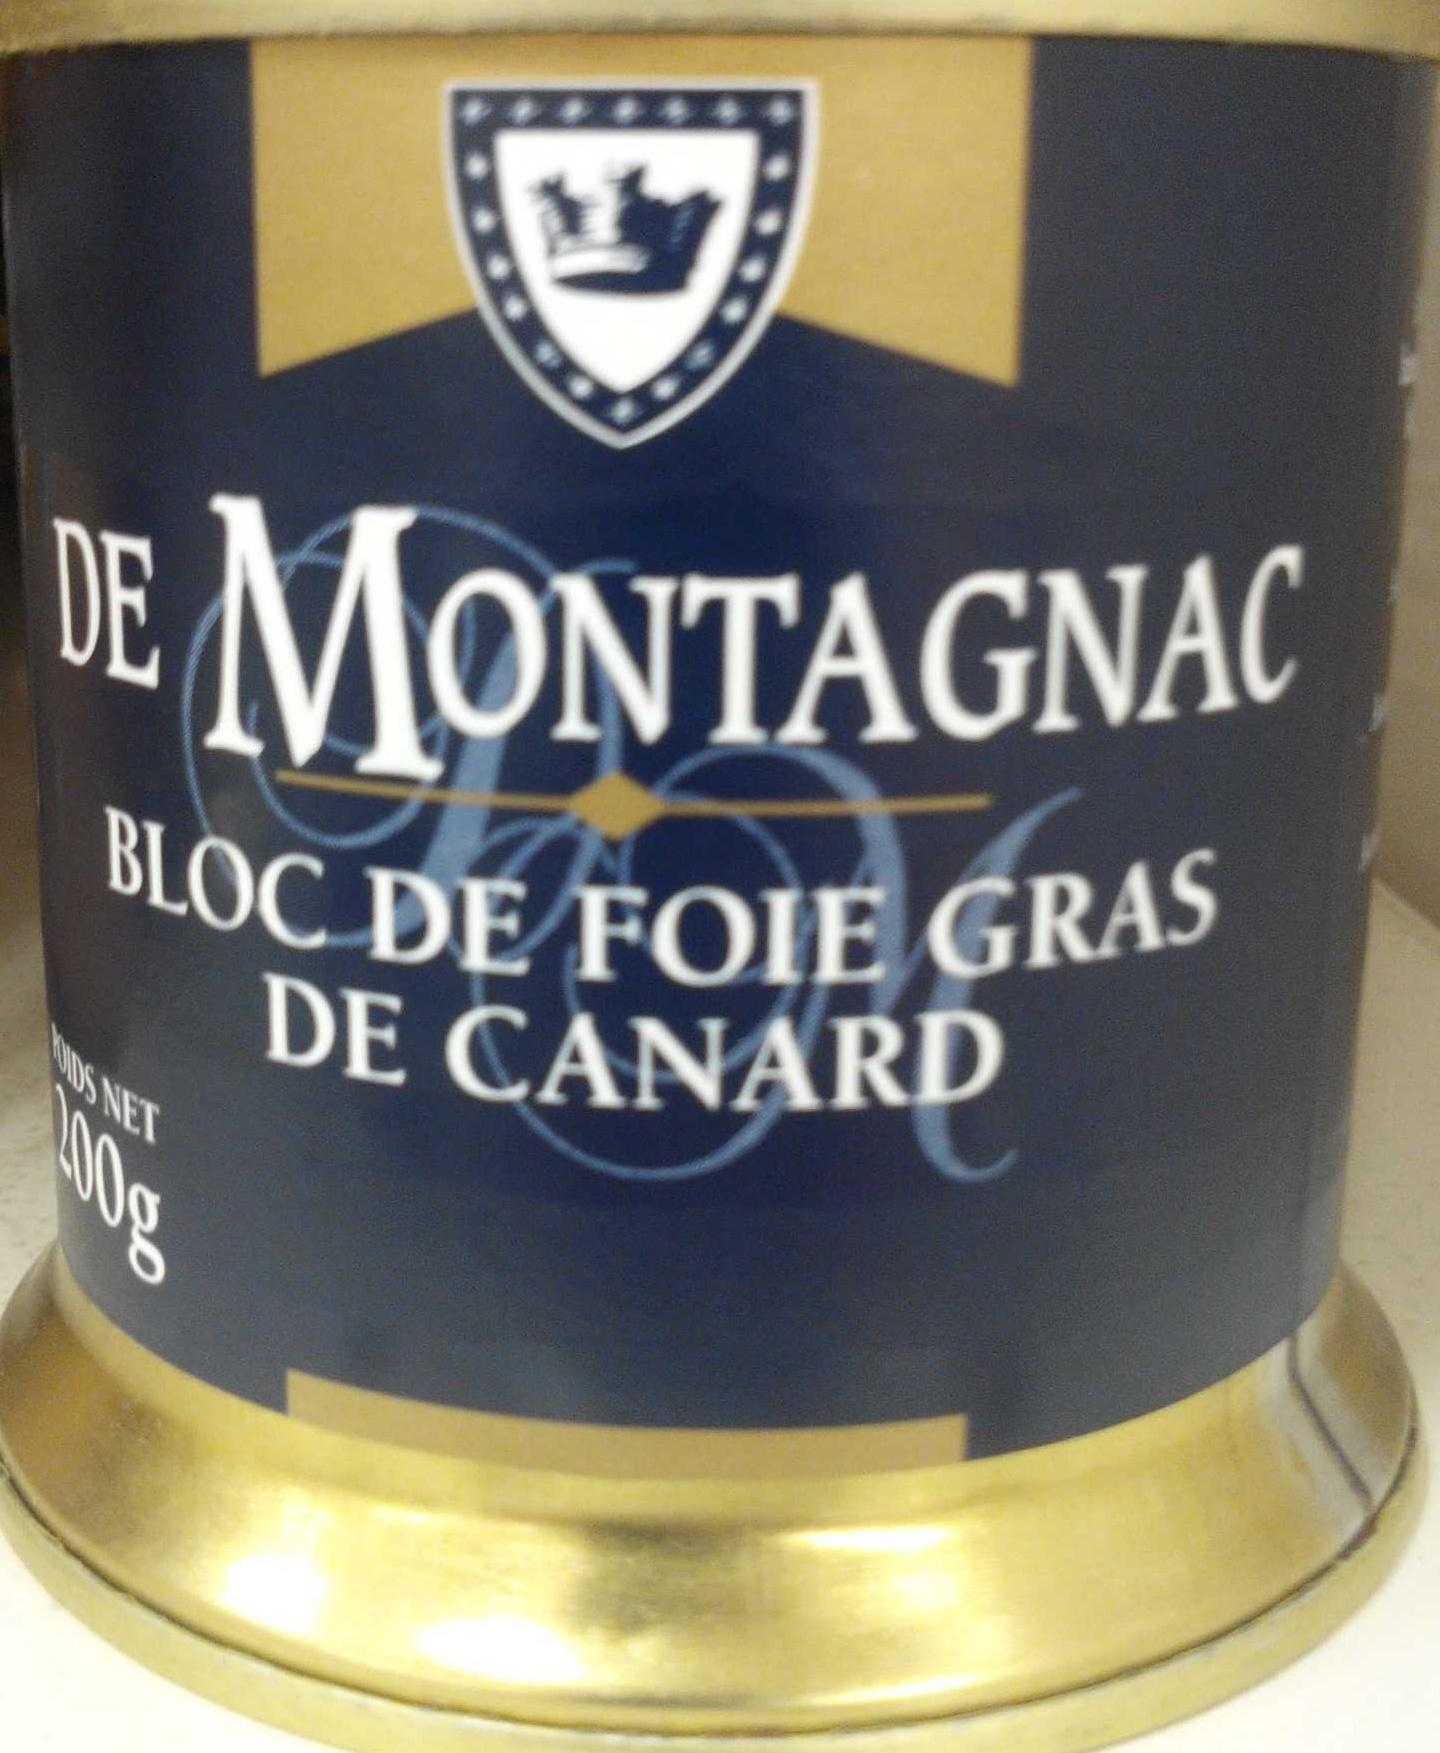 bloc de foie gras de canard de montagnaque 200 g. Black Bedroom Furniture Sets. Home Design Ideas